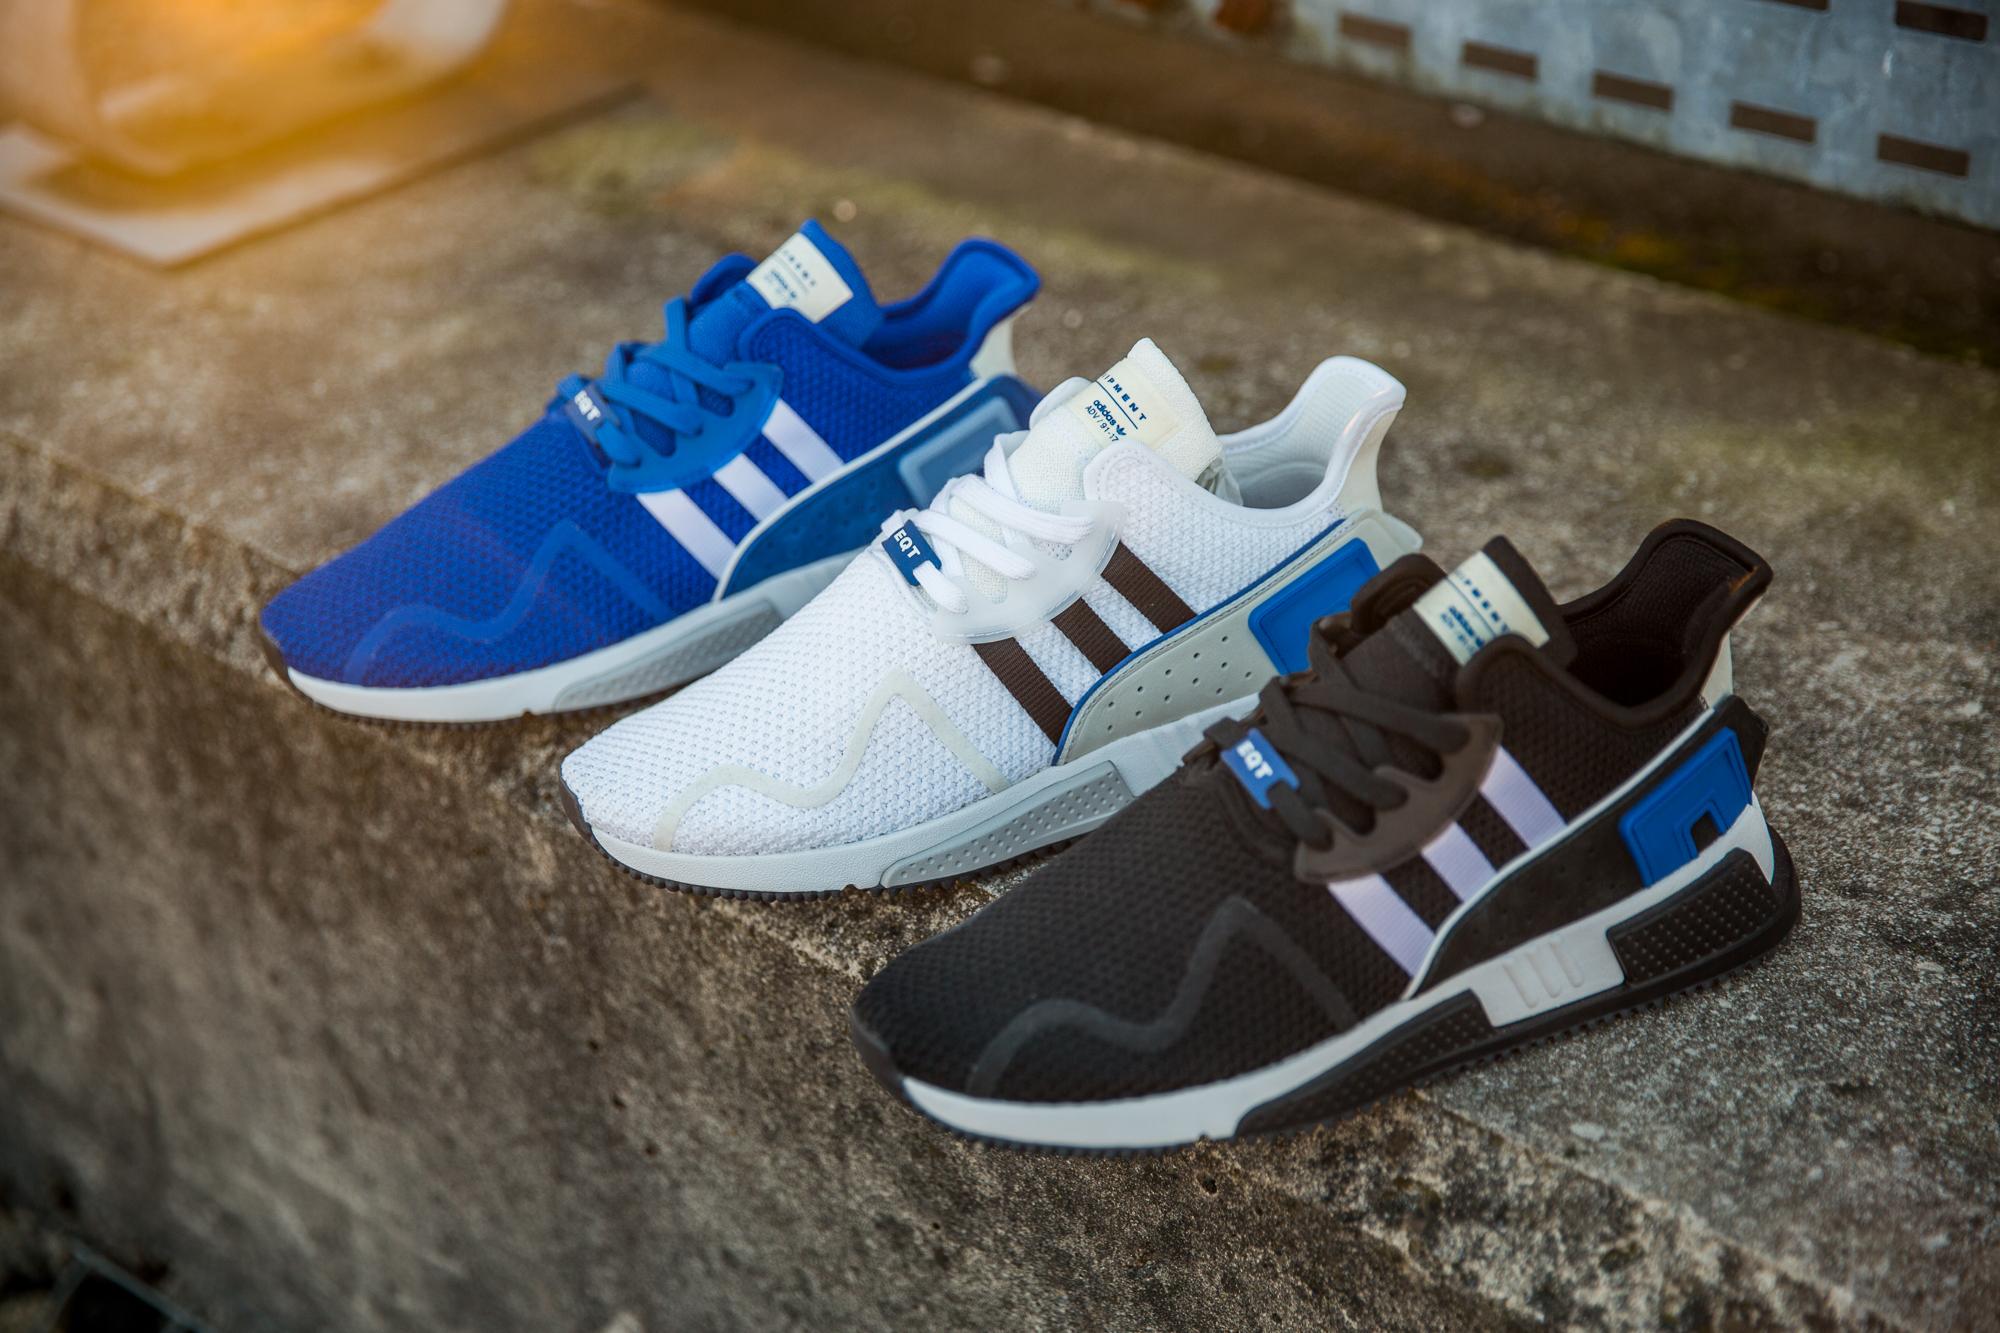 adidas Originals EQT Cushion ADV 'Blue' Pack